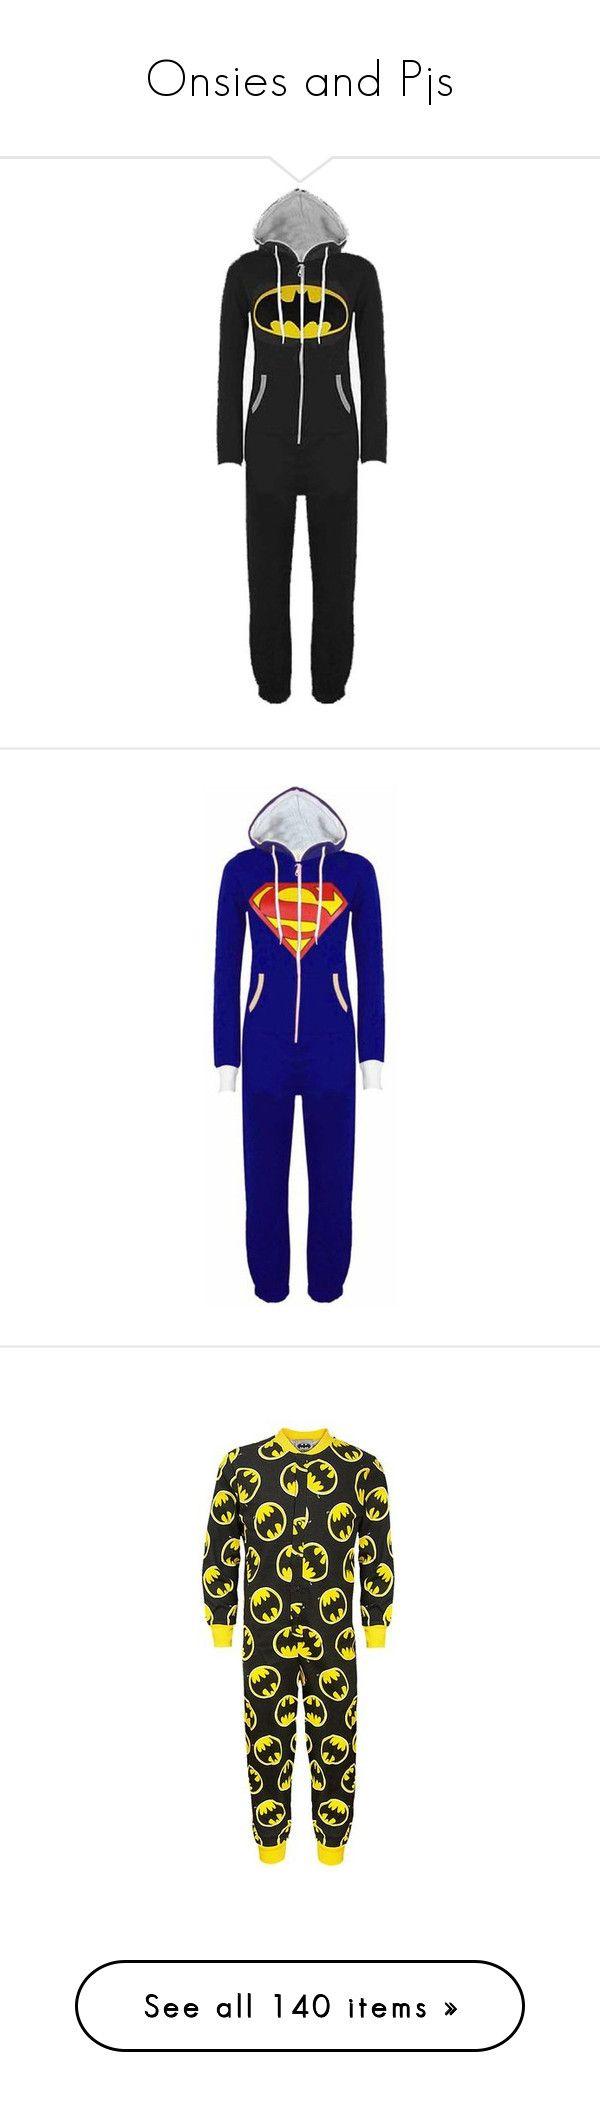 """Onsies and Pjs"" by pierce-the-muflafla ❤ liked on Polyvore featuring pajamas, onesie, pyjamas, intimates, one piece, mens, men's clothing, batman, pijamas and sleepwear"